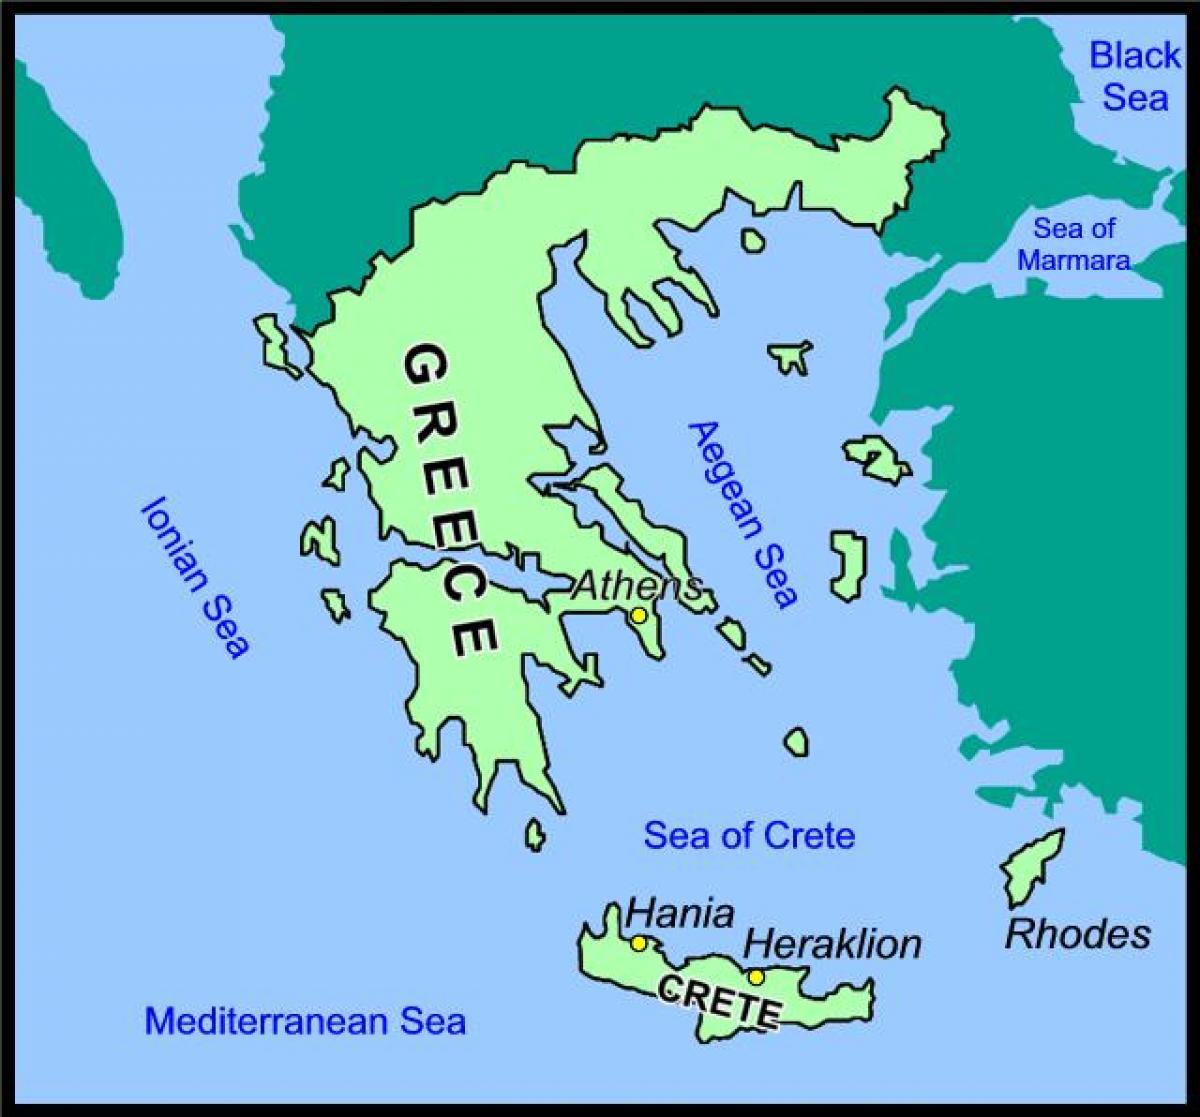 kreta kart norsk Kreta kart Hellas   Kart over Kreta, Hellas (Sør Europa   Europa) kreta kart norsk